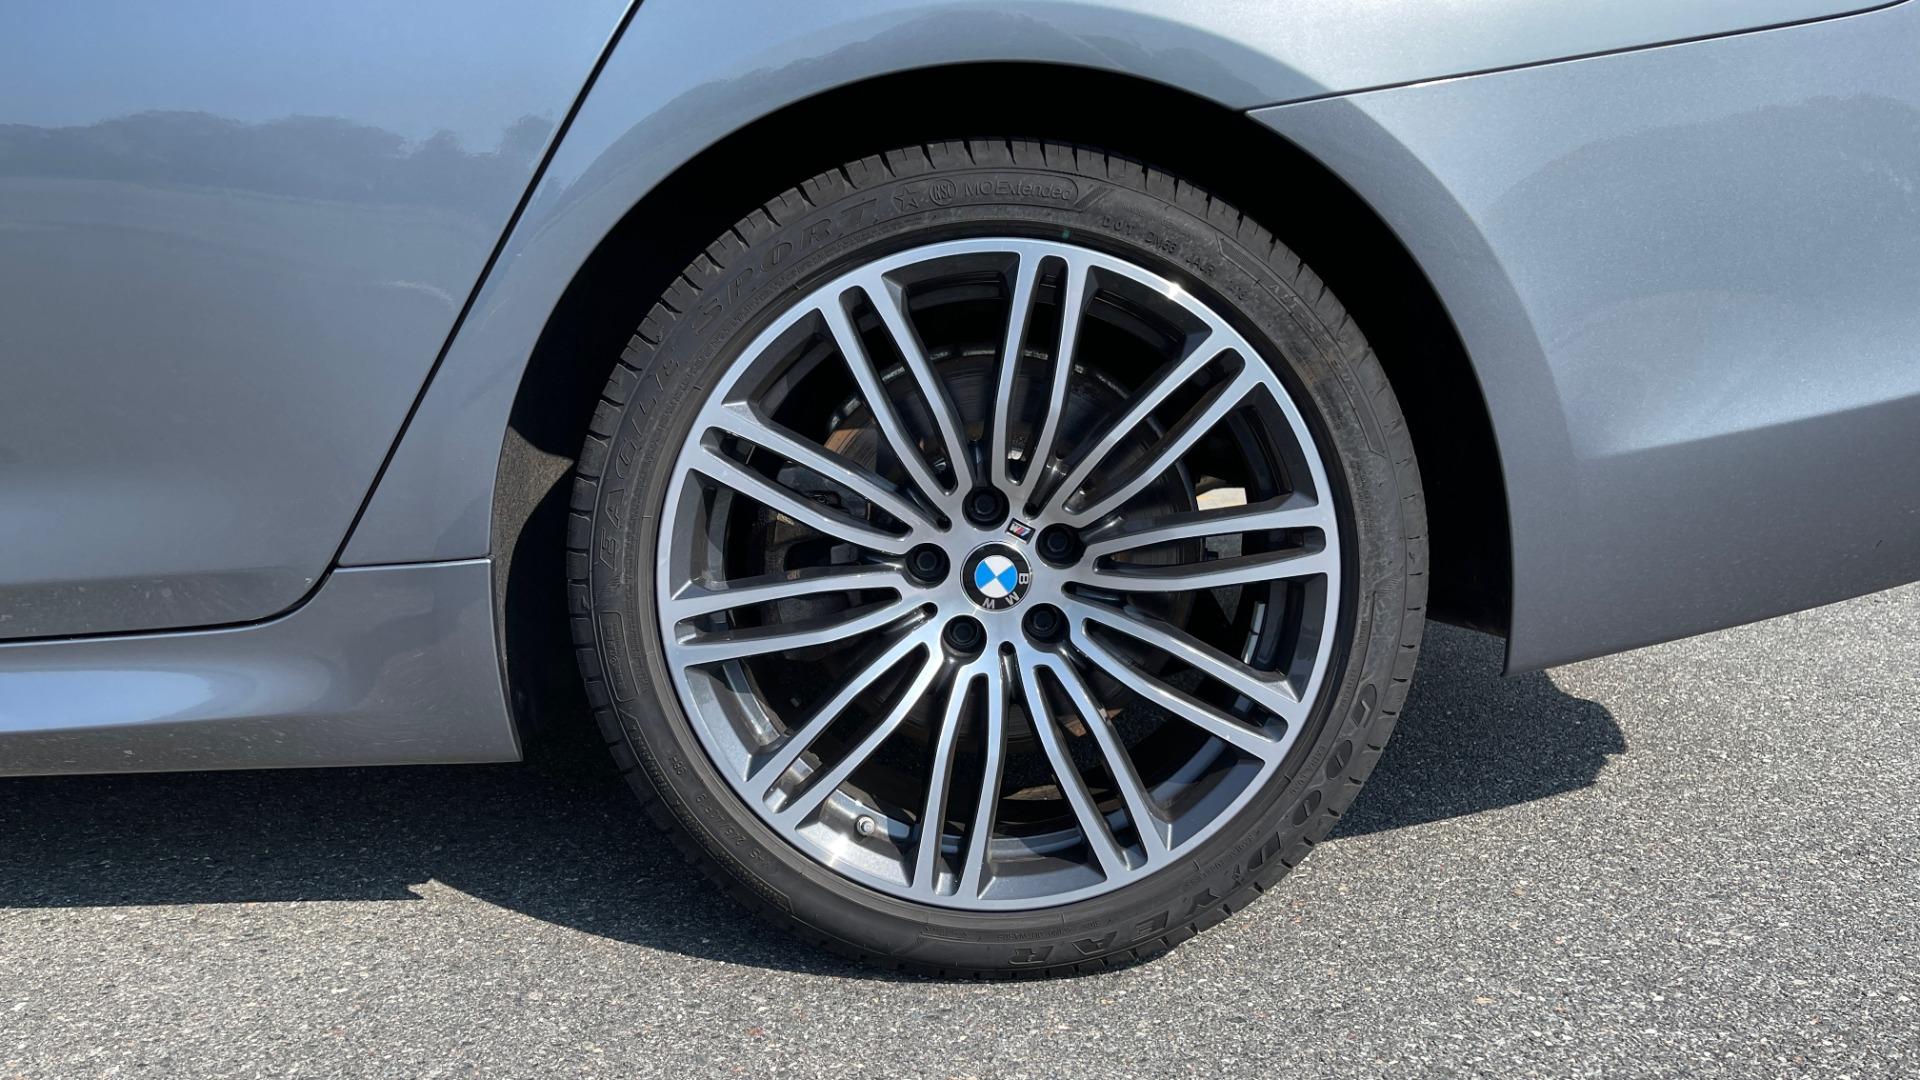 Used 2018 BMW 5 SERIES 540I XDRIVE M-SPORT / DRVR ASST / PDC / APPLE / HUD / H/K SND for sale $42,795 at Formula Imports in Charlotte NC 28227 70